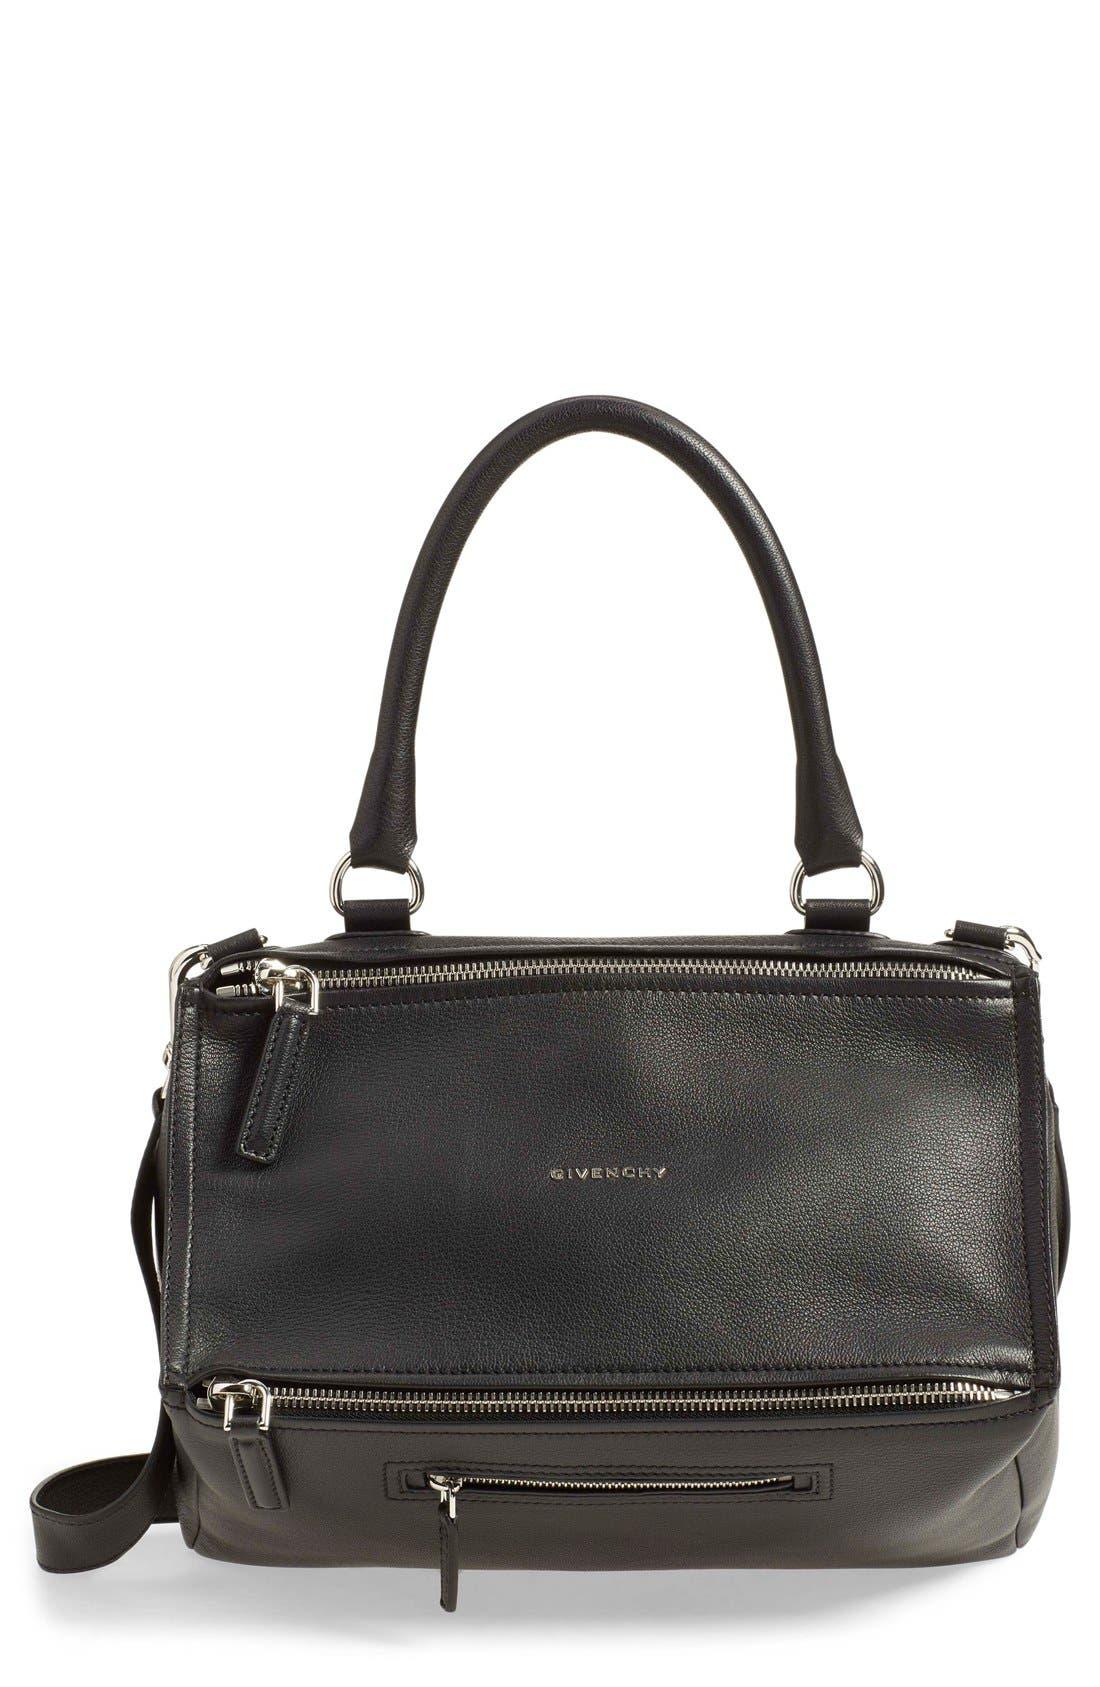 'Medium Pandora' Sugar Leather Satchel,                         Main,                         color, Black